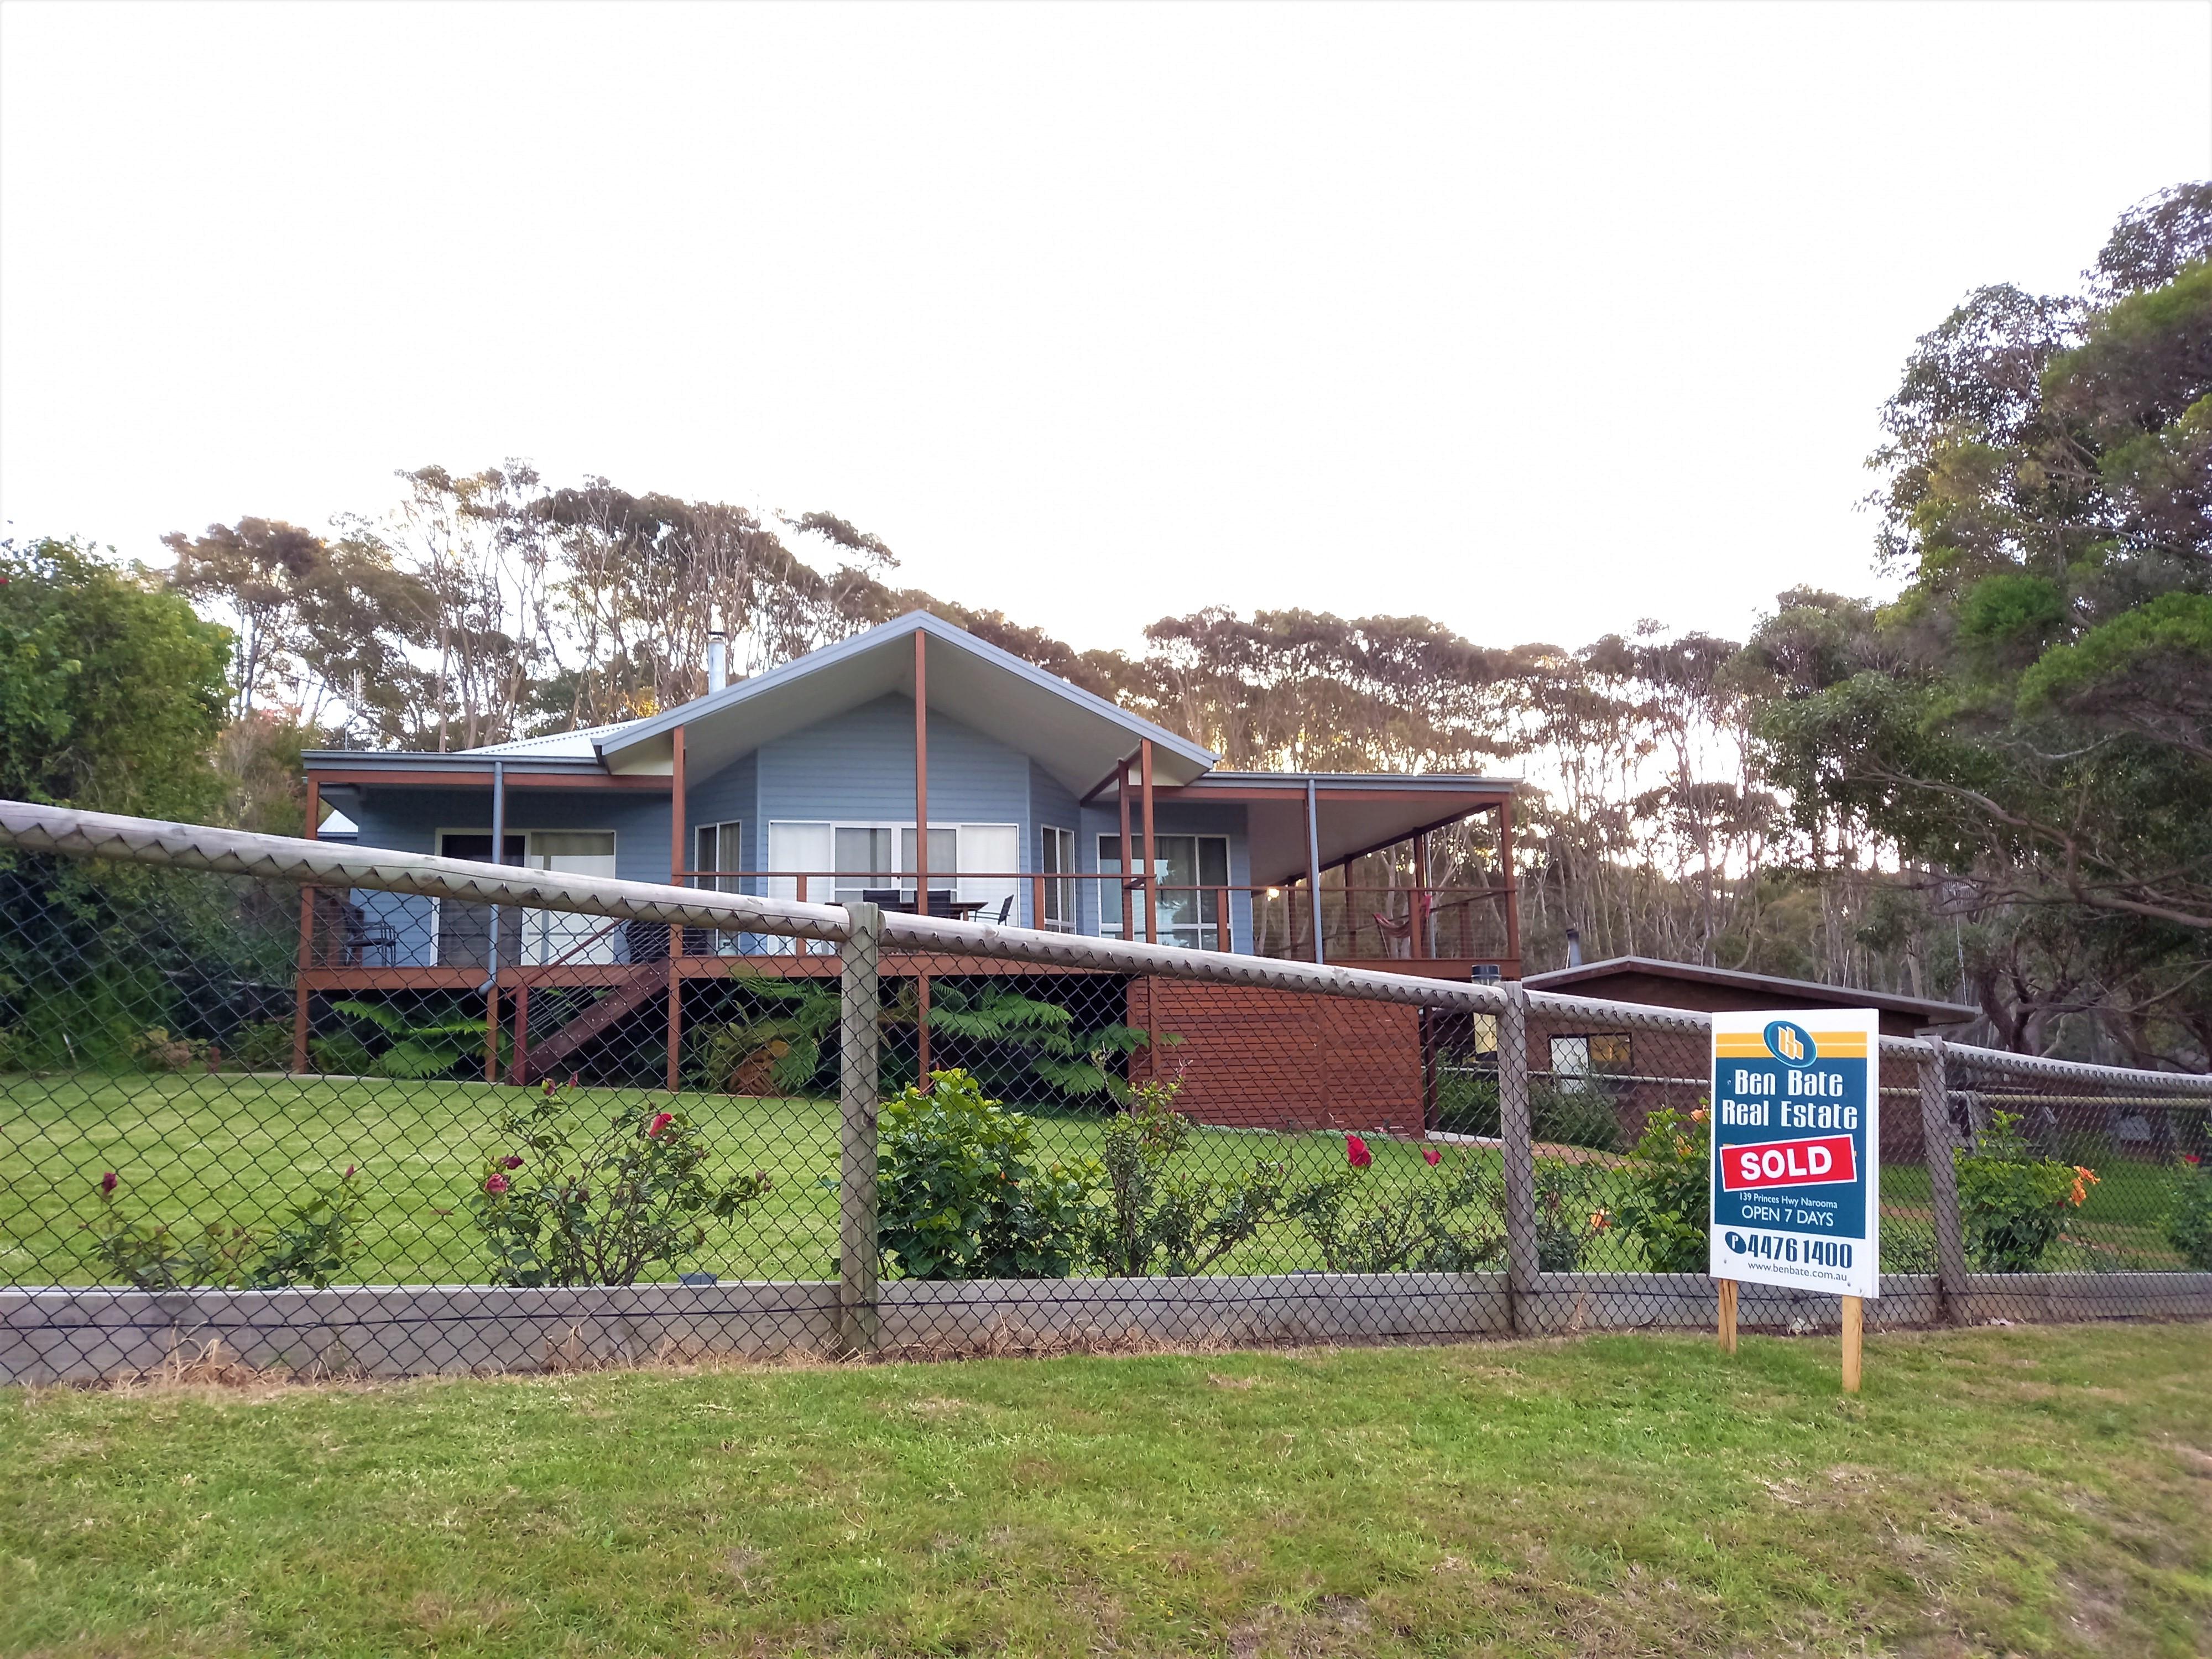 Sale of house in Dalmeny 2021